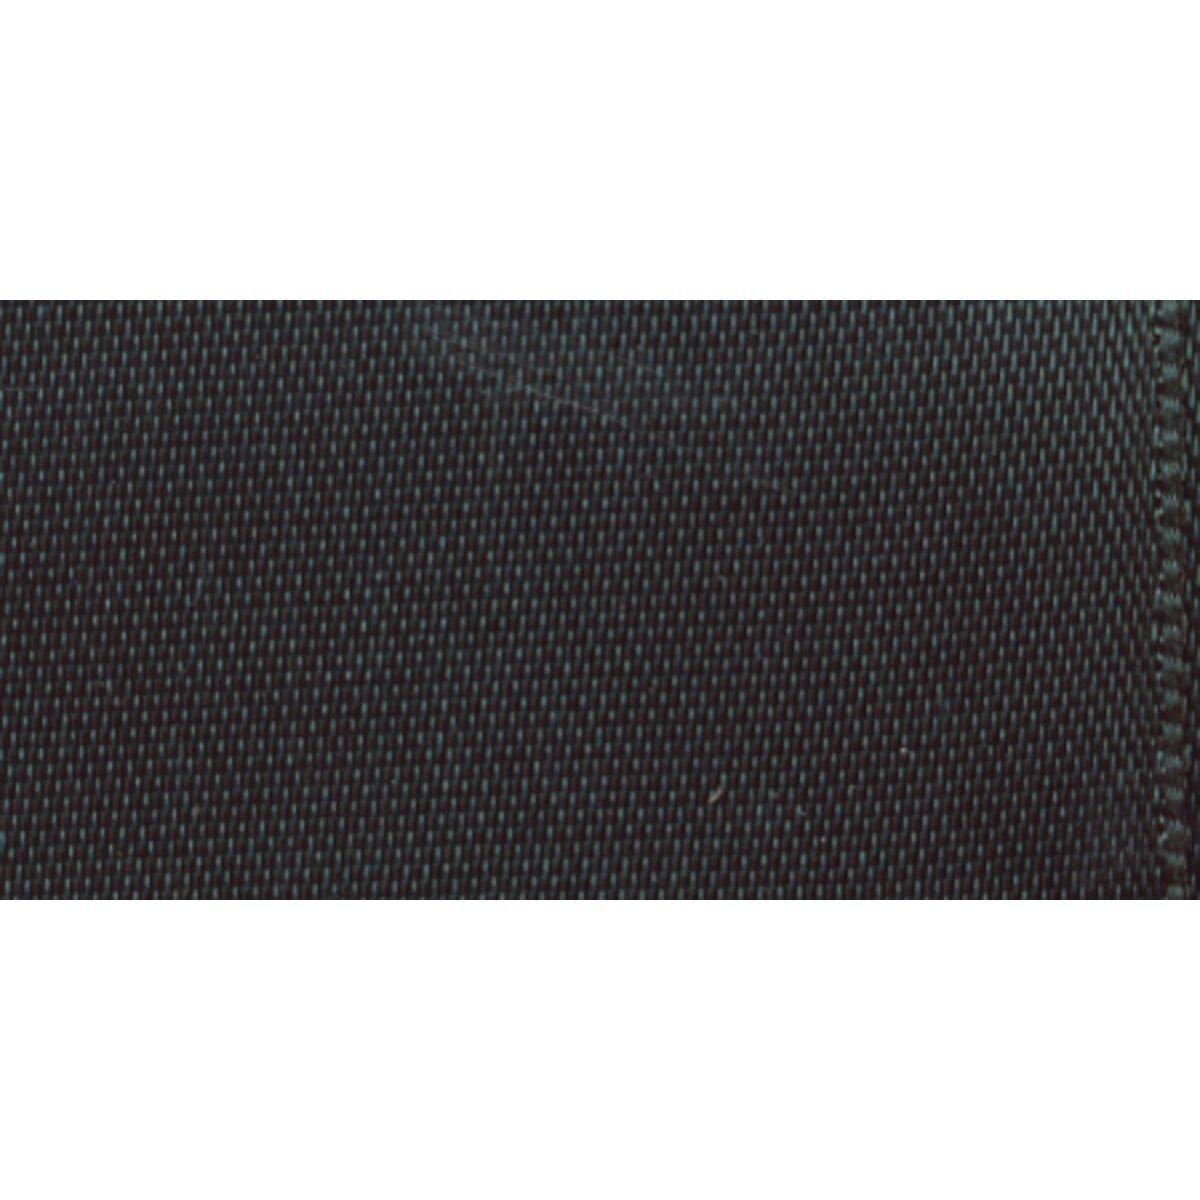 4.75-Yard Leaf Green Wrights 117-794-922 Single Fold Satin Blanket Binding